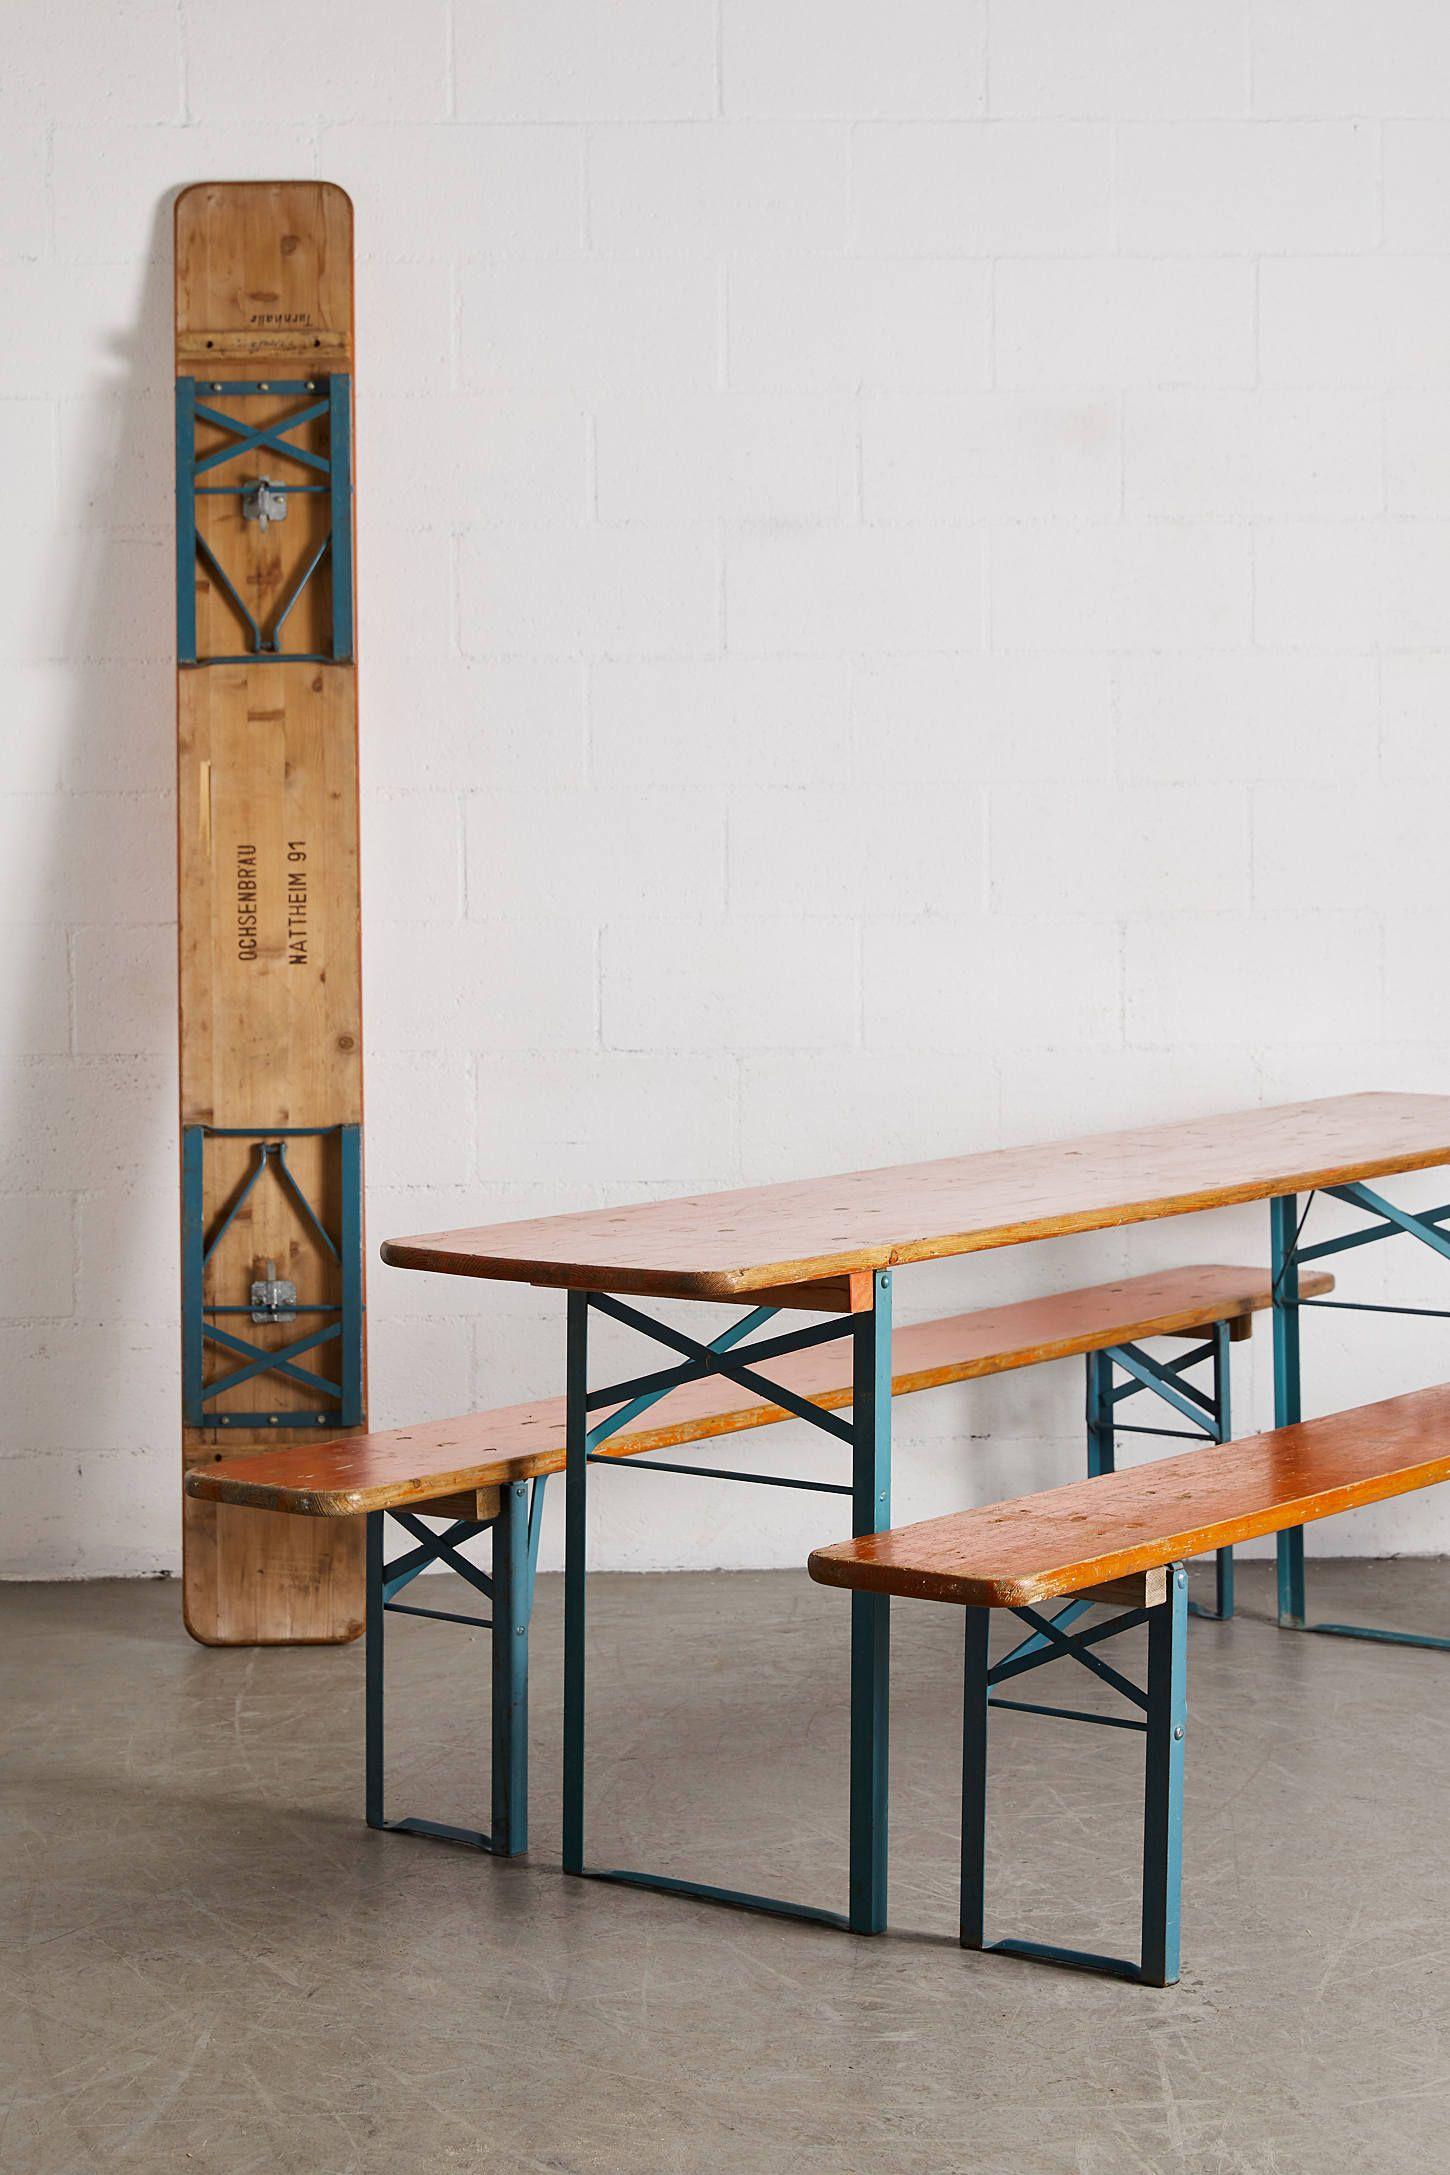 Urban Renewal Vintage Beer Garden Picnic Table Bench Set With Images Picnic Table Bench Bench Table Garden Picnic